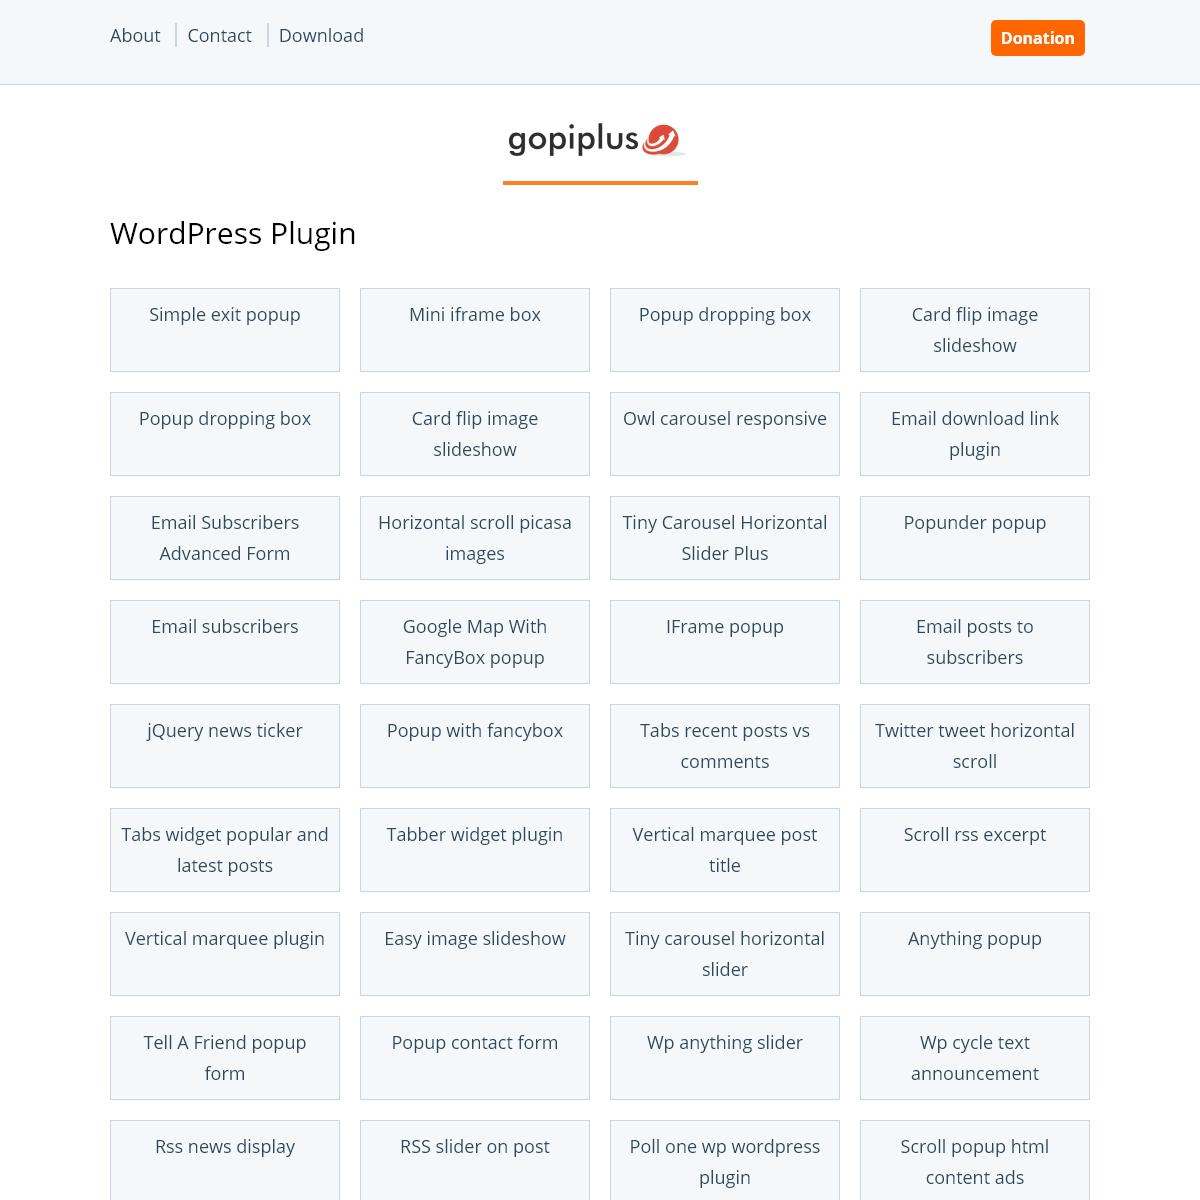 Gopiplus.com - Wordpress plugin